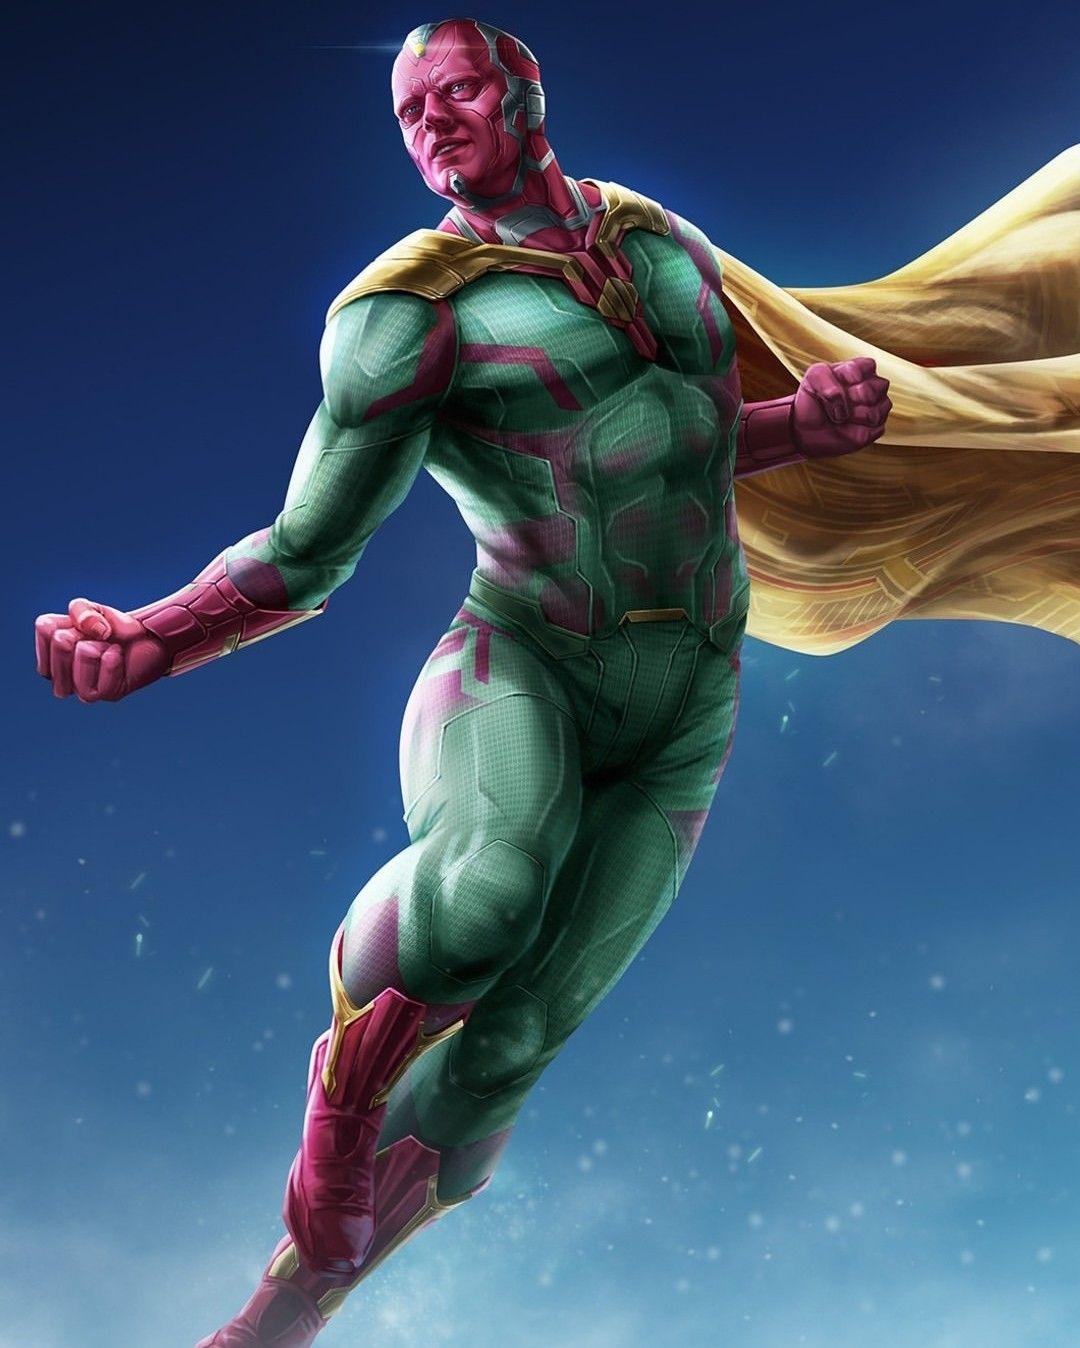 ALL-NEW ALL-DIFFERENT MARVEL PREVIEWS # 1 SEPT 2015 SPIDER-MAN AVENGERS HULK